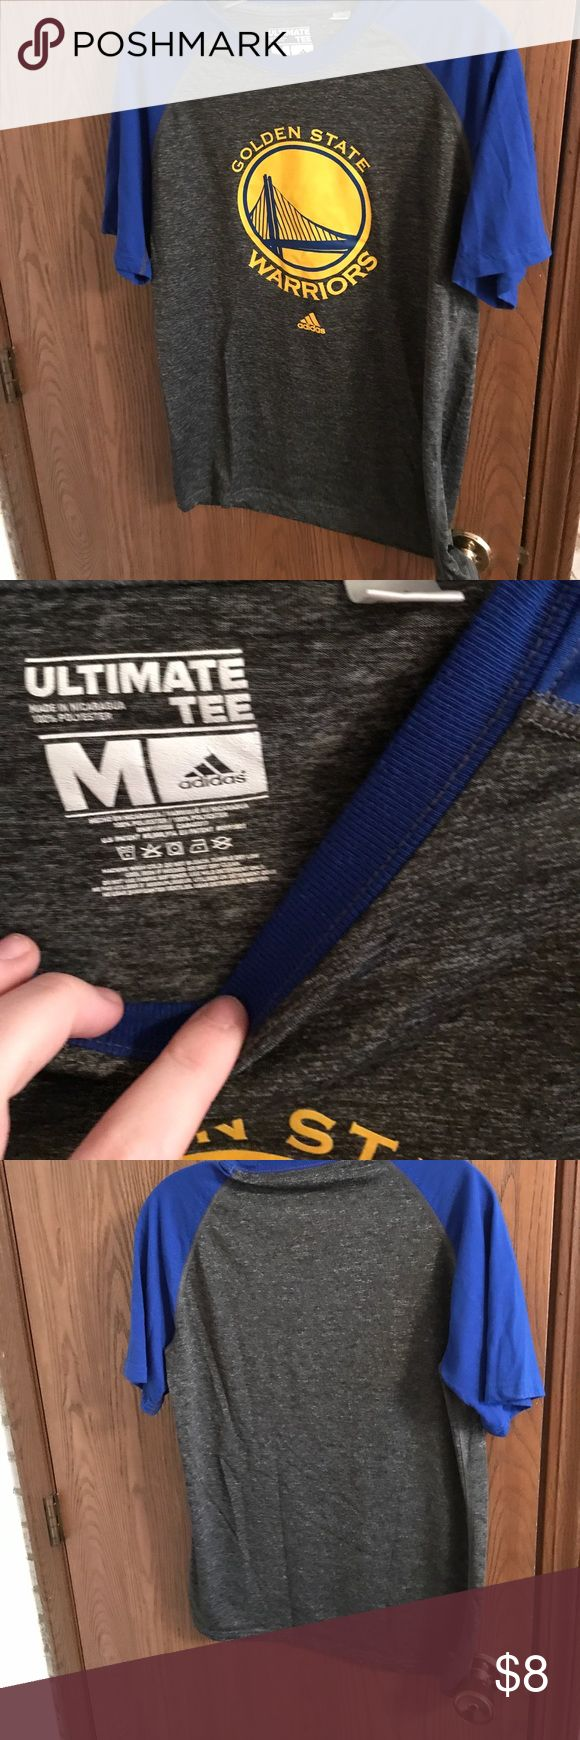 Golden State Warriors shirt. Men's Blue and gray Adidas Golden Stare Warriors shorts. Dri-fit material. adidas Shirts Tees - Short Sleeve